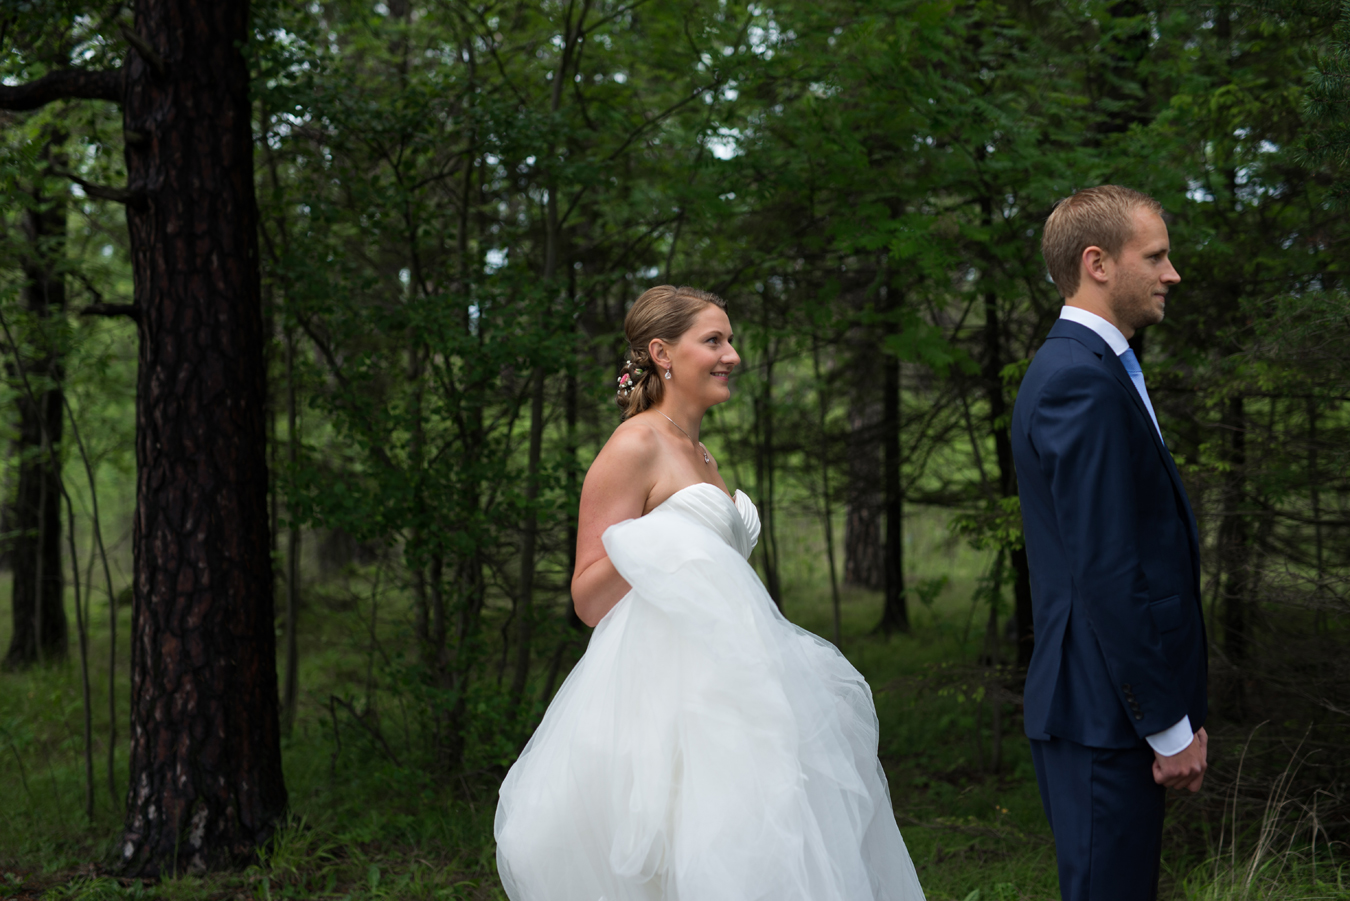 039-bröllopsfotograf-folhammar-gotland-neas-fotografi.jpg